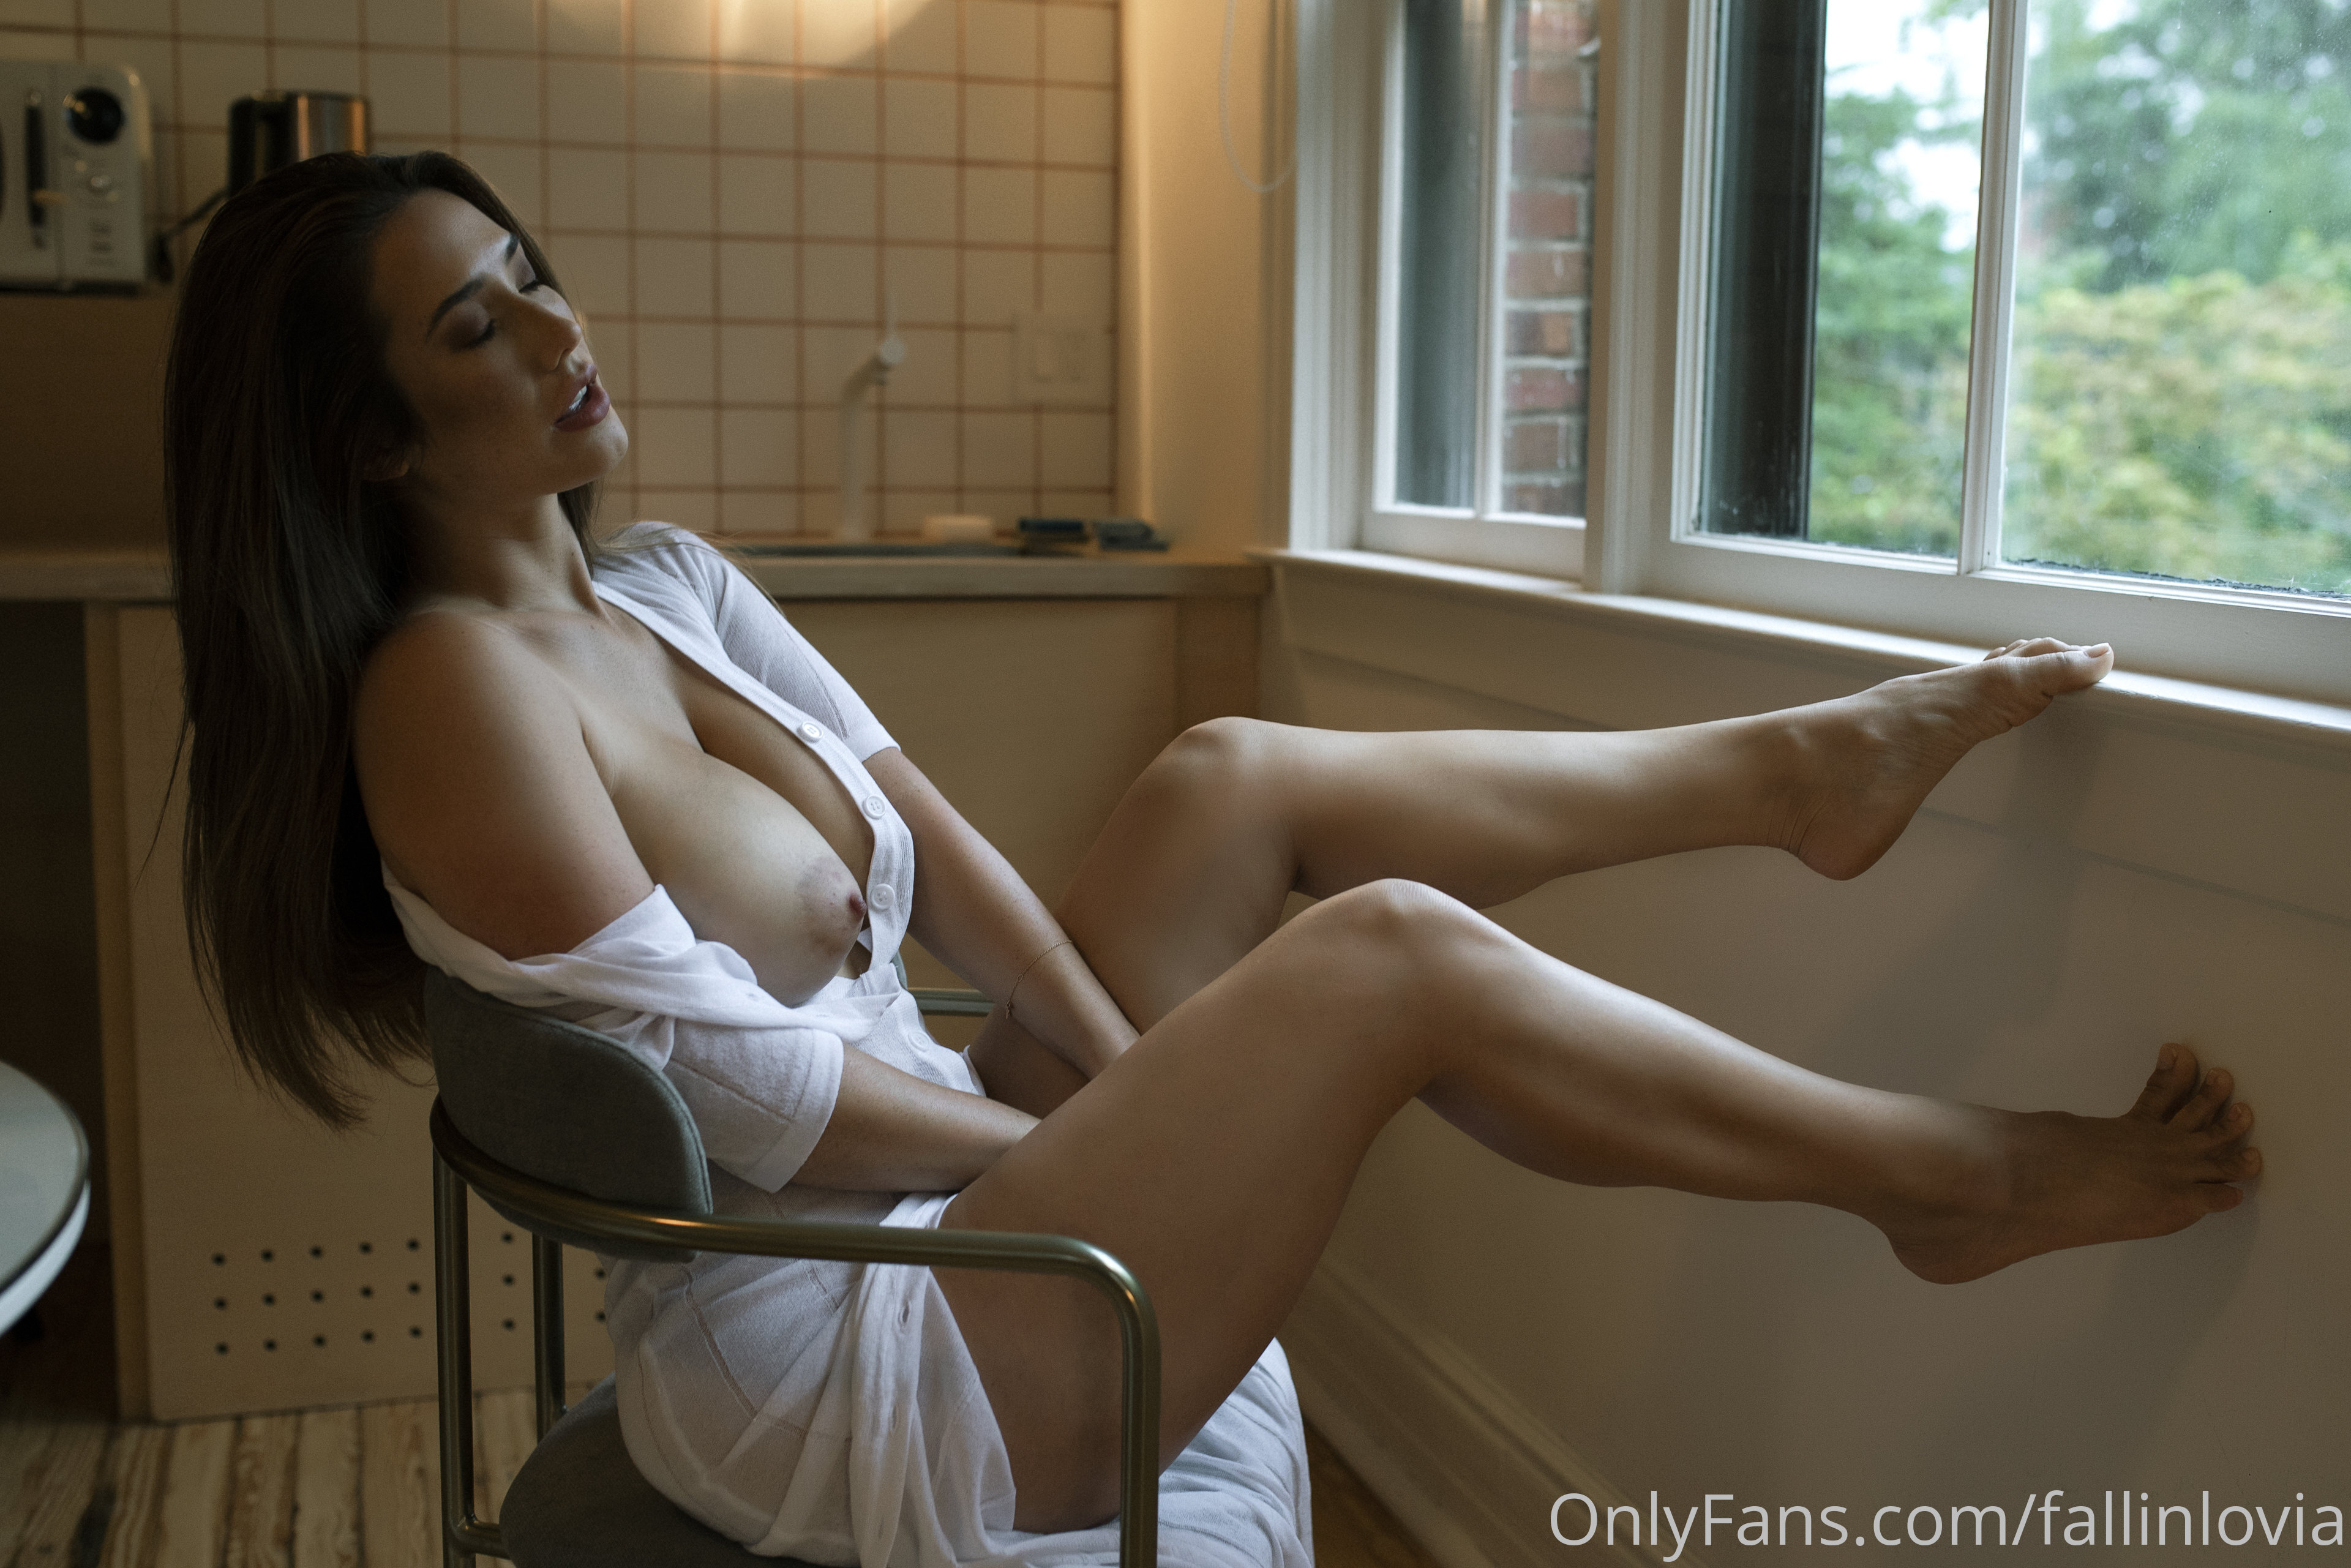 Eva Lovia, Fallinlovia, Onlyfans 0296